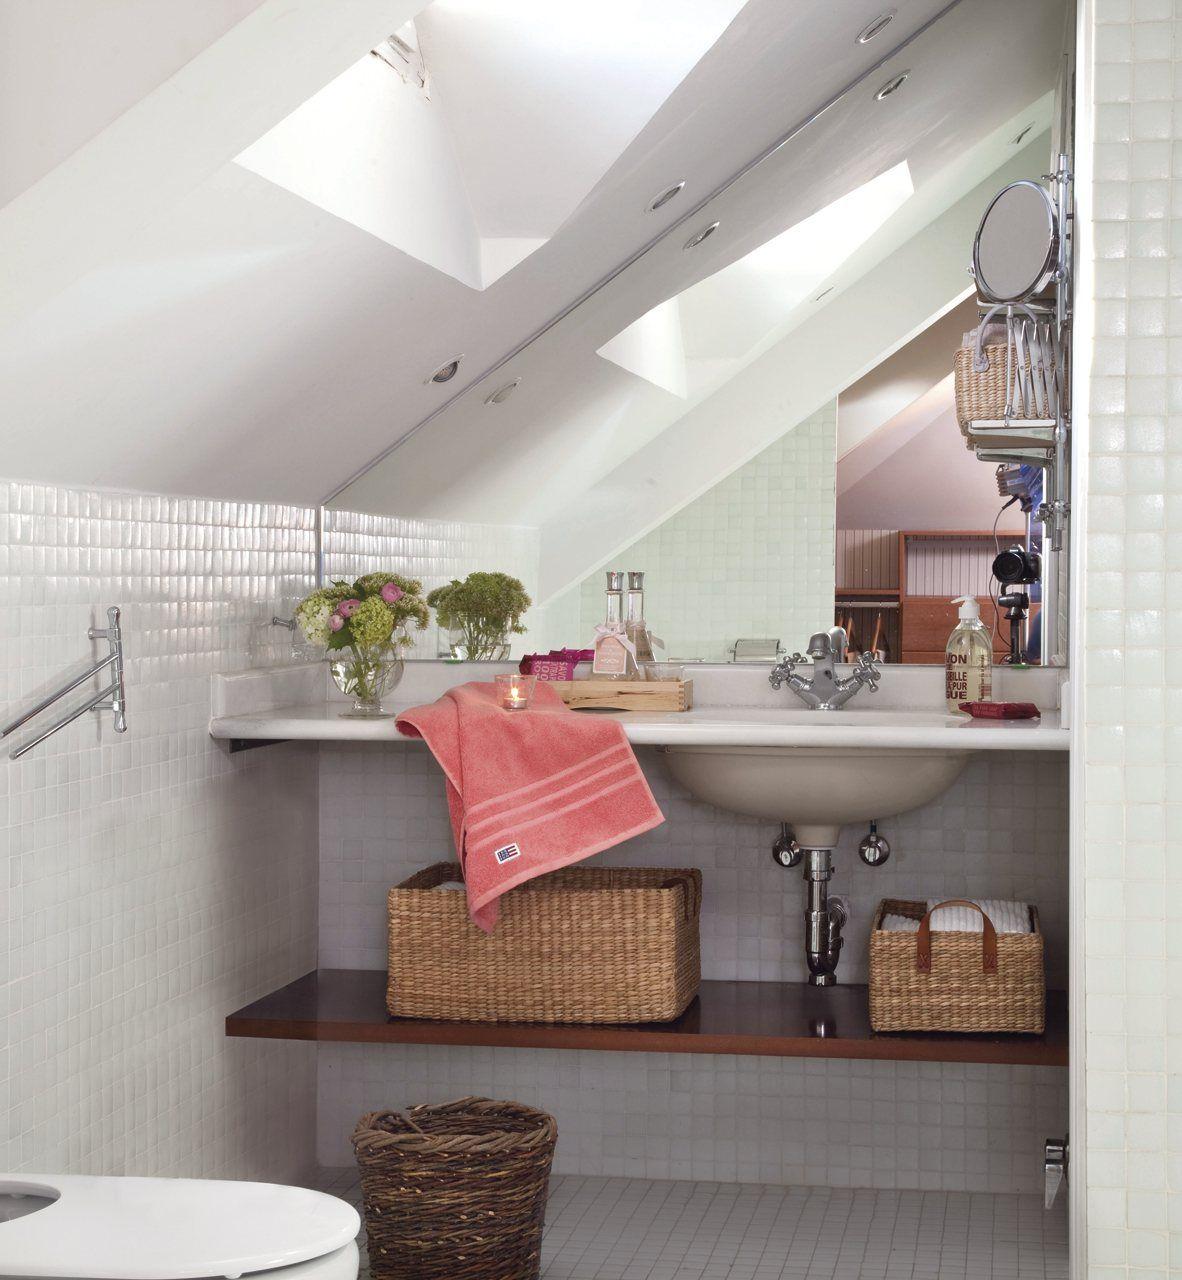 Ba o actual zalo sin gastar mucho ba o bathroom for Renovar azulejo bano concreto cera